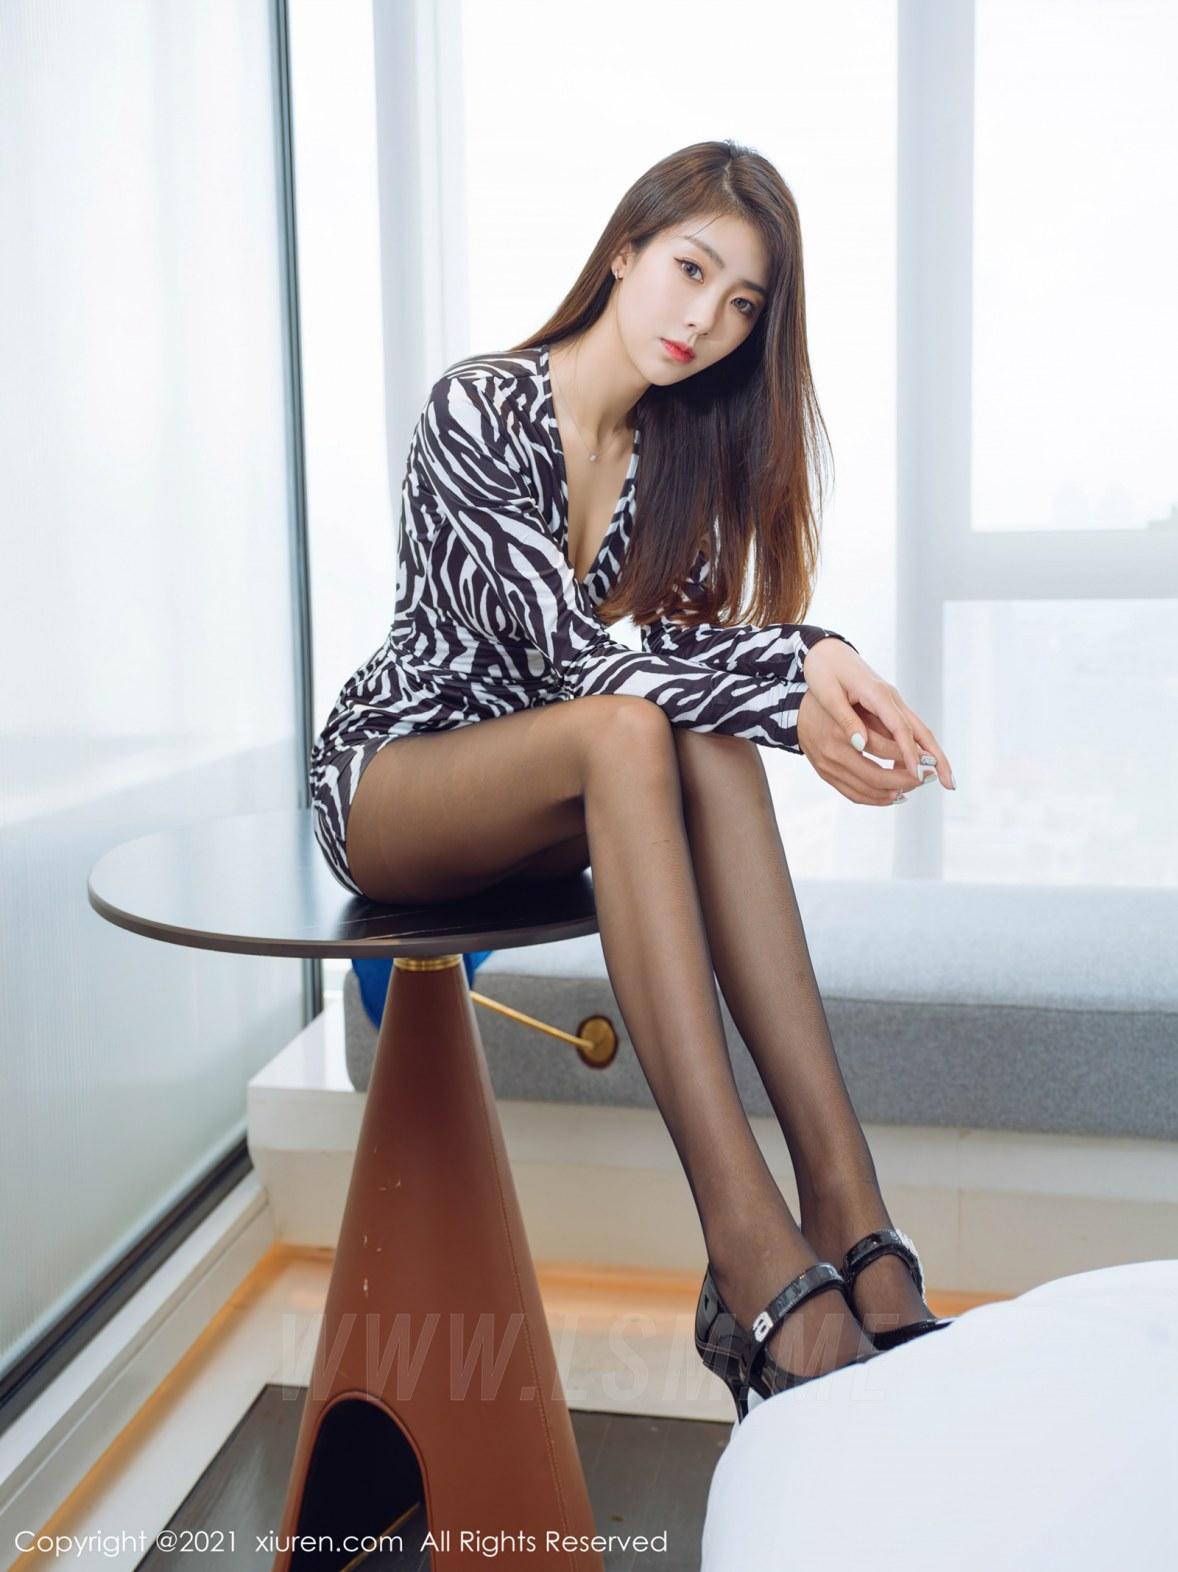 3890 022 s8a 4047 5400 - XiuRen 秀人 No.3890 斑纹短裙 可樂Vicky 性感写真2 - 秀人网 -【免费在线写真】【丽人丝语】